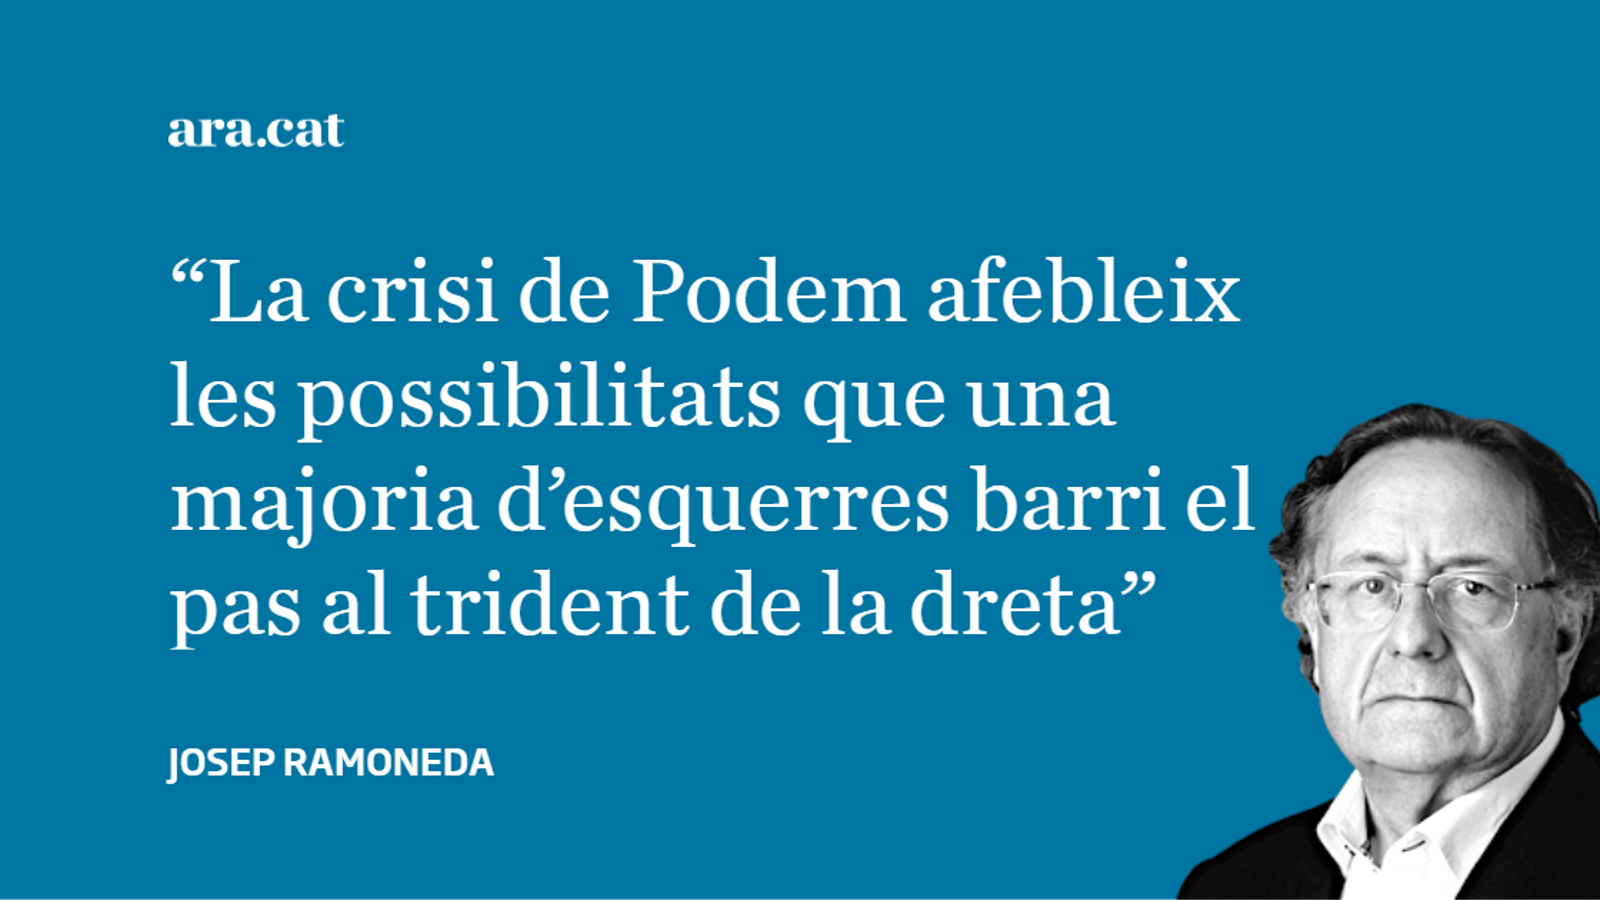 Terrabastall Podem